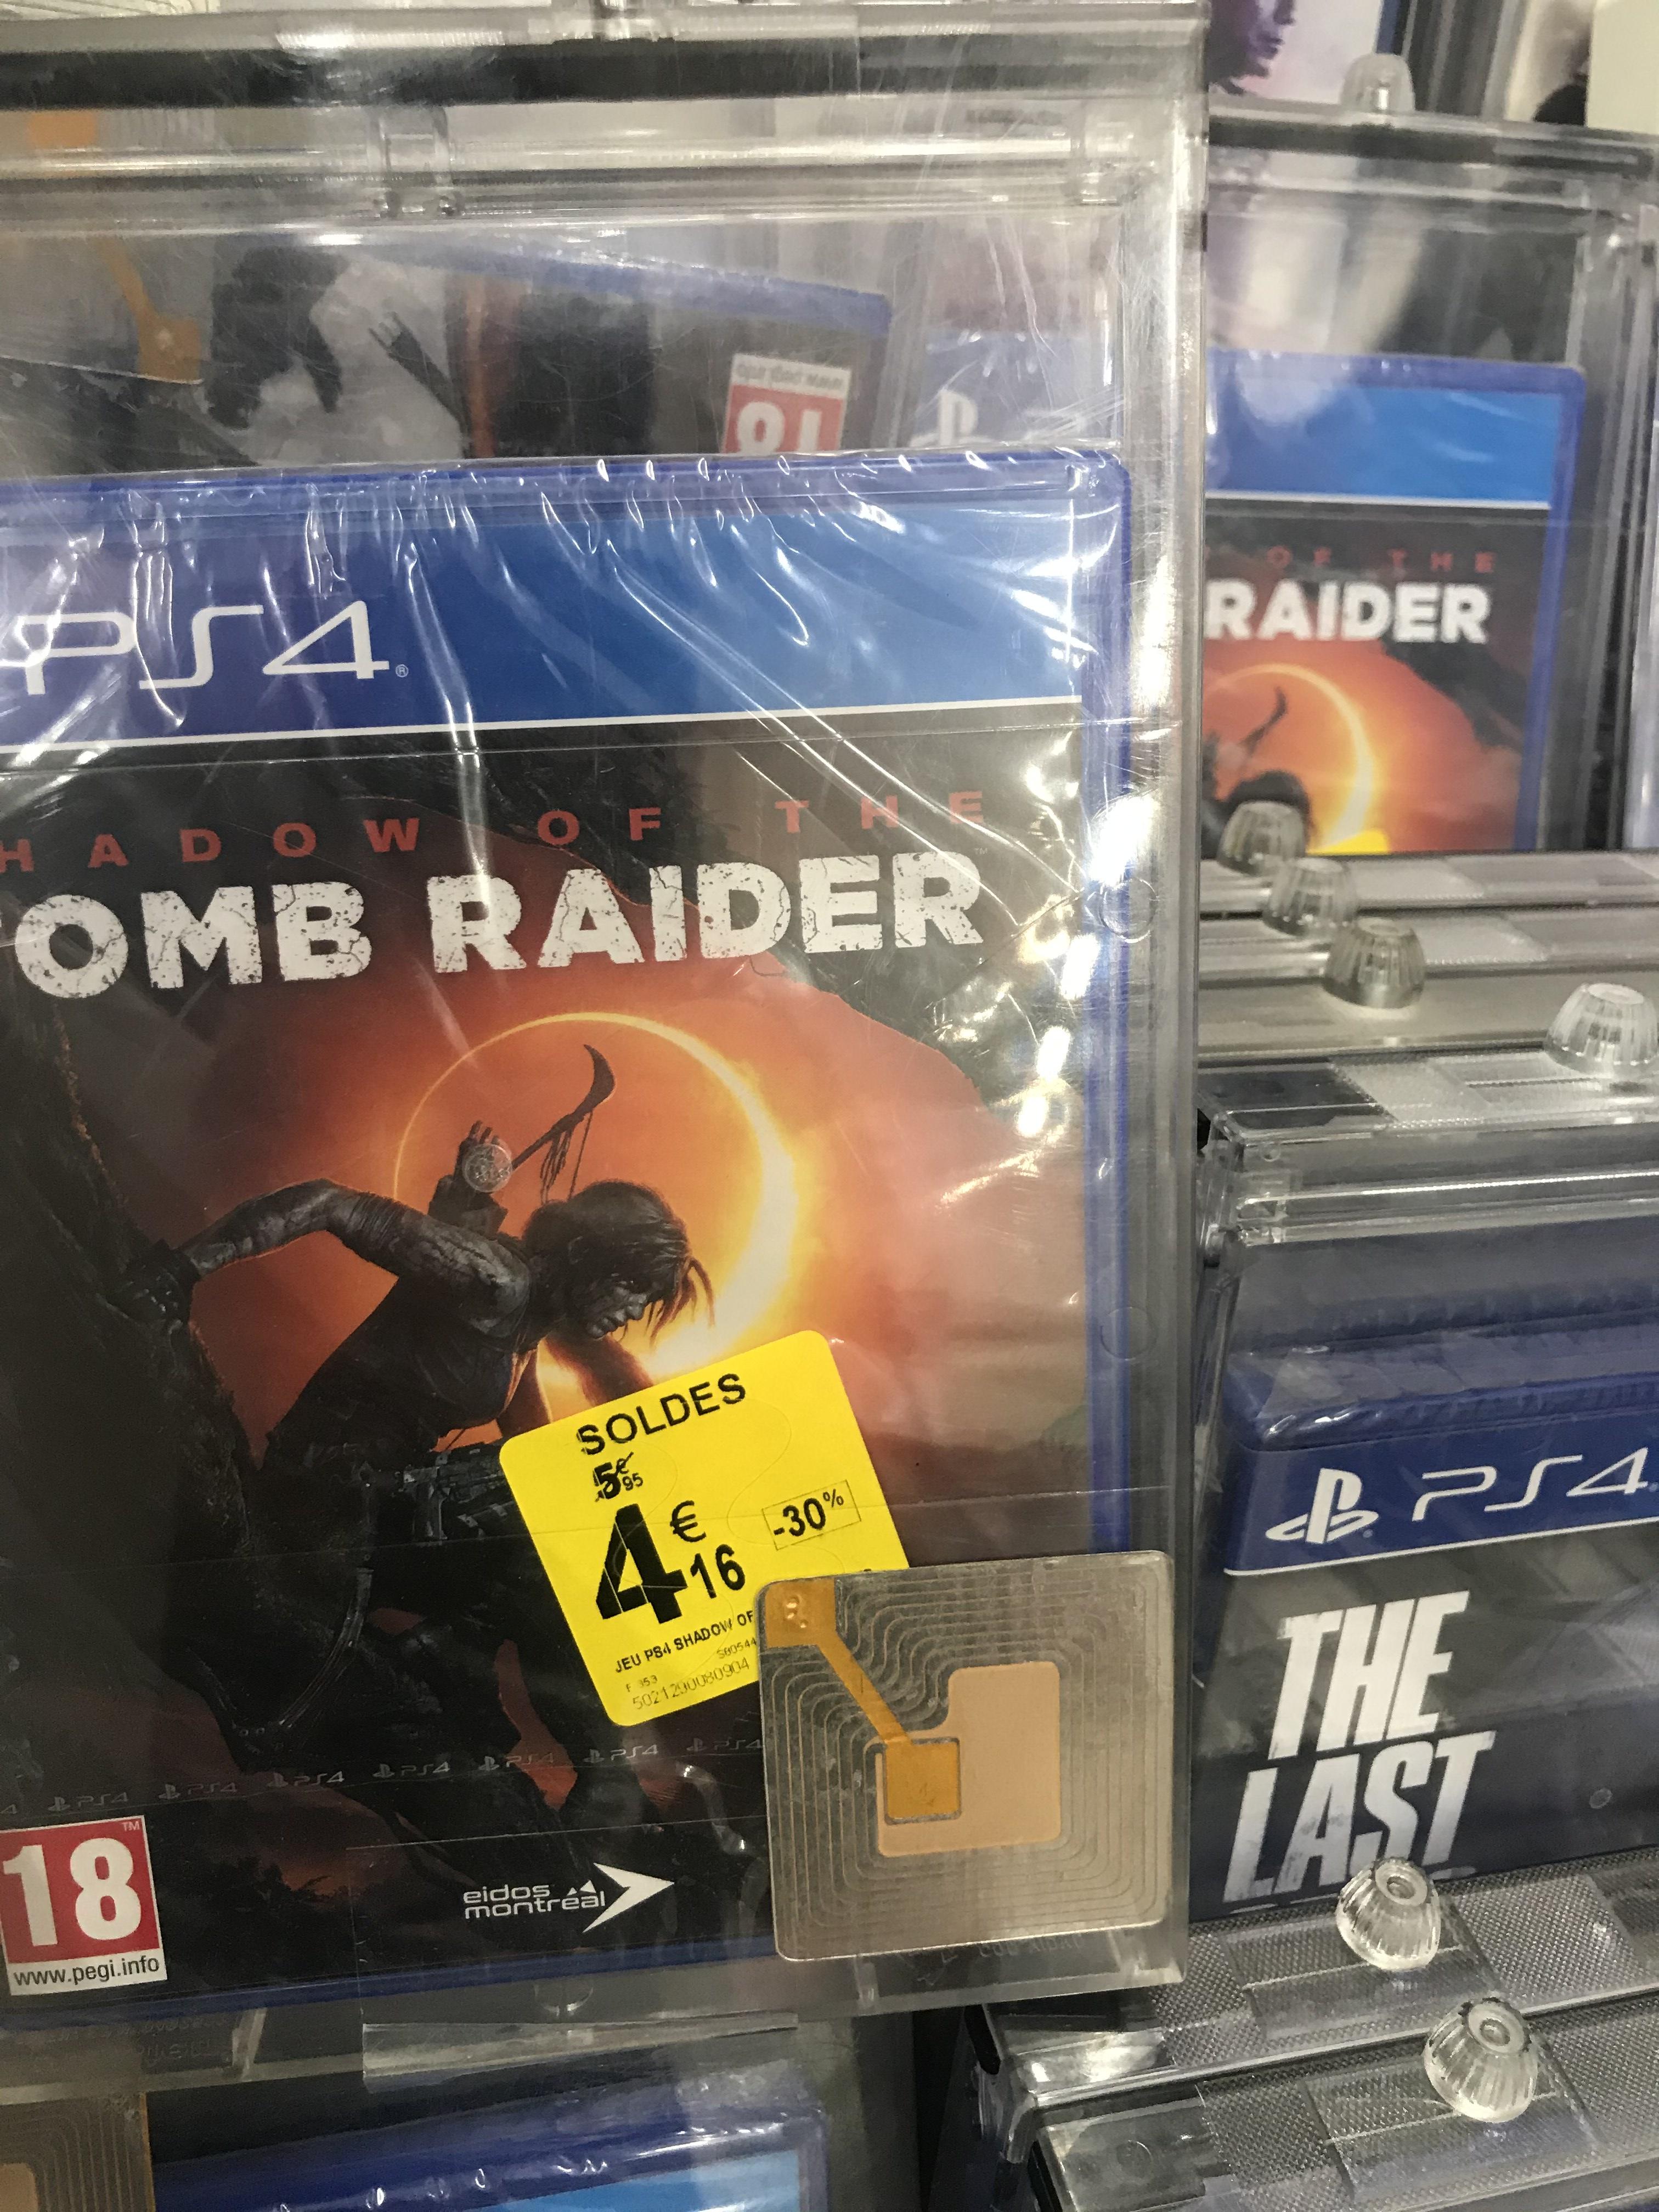 Shadow of the Tomb Raider sur PS4 - Châsse sur Rhône (38)